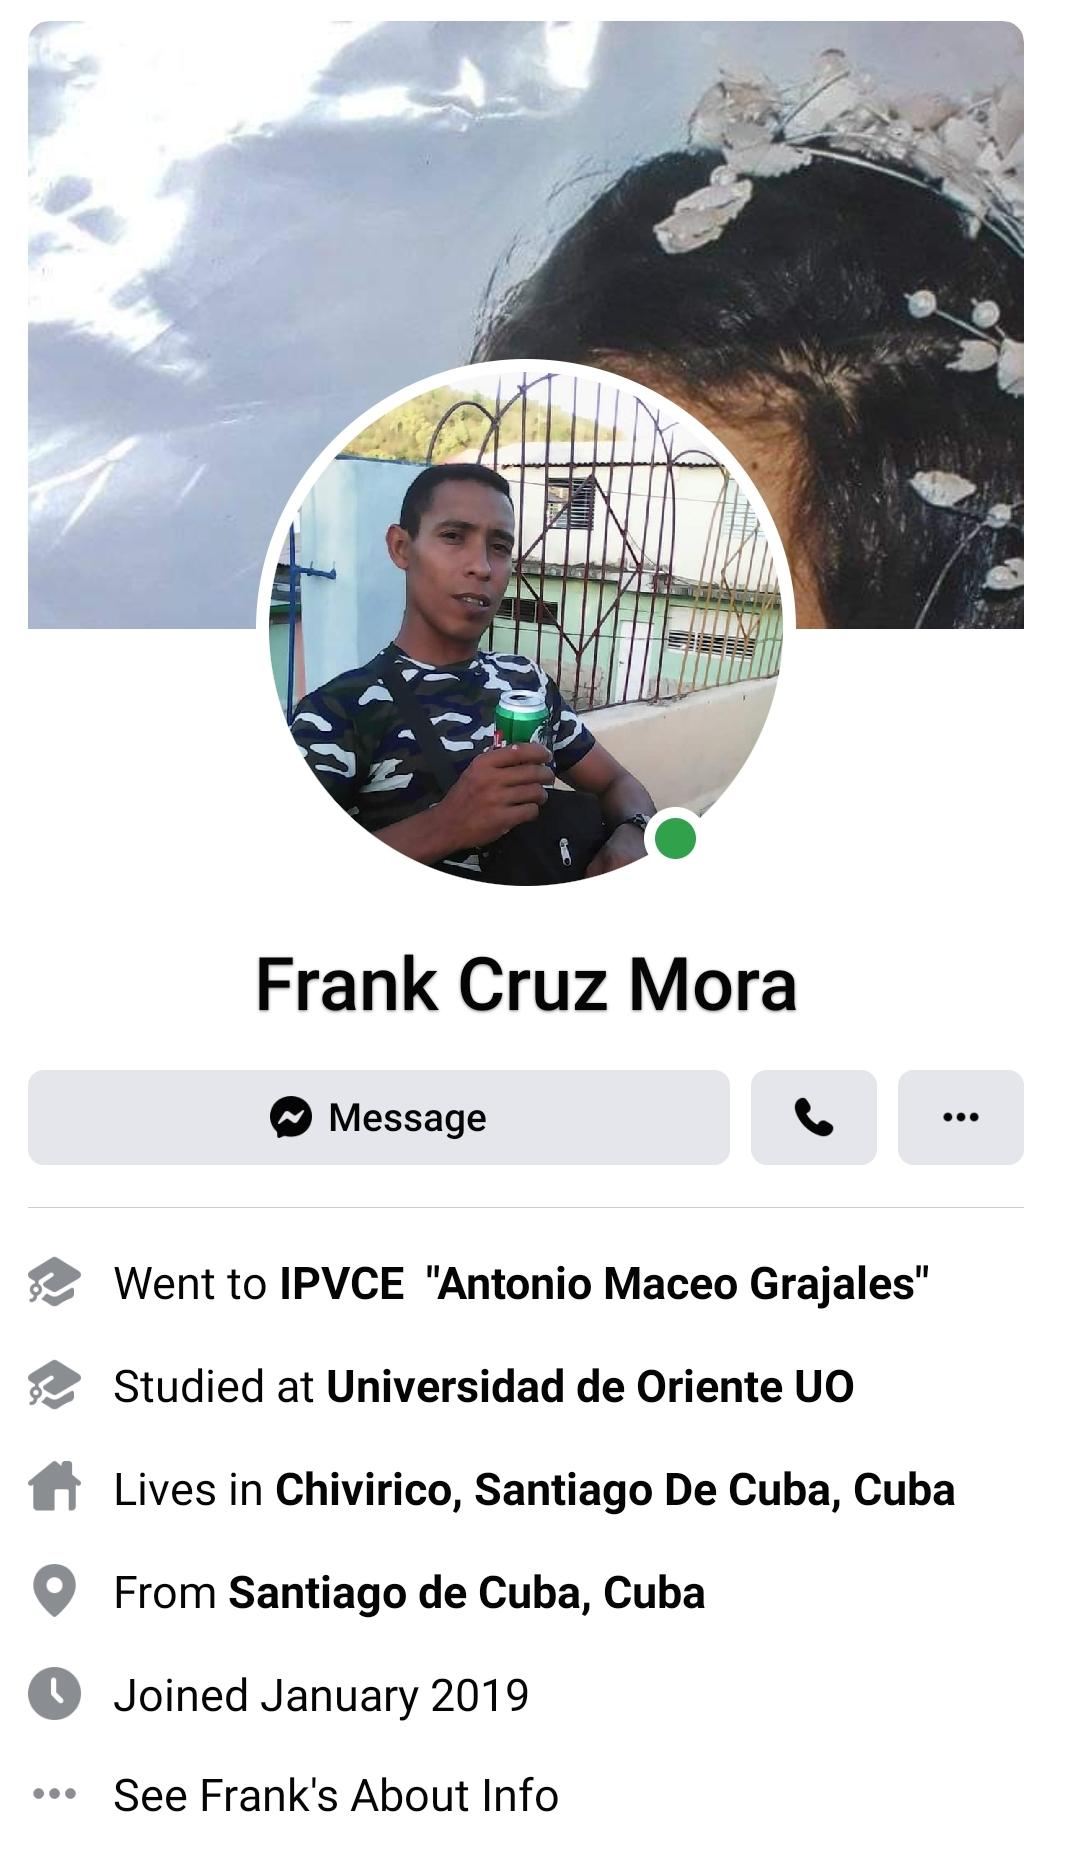 Frank Cruz Mora